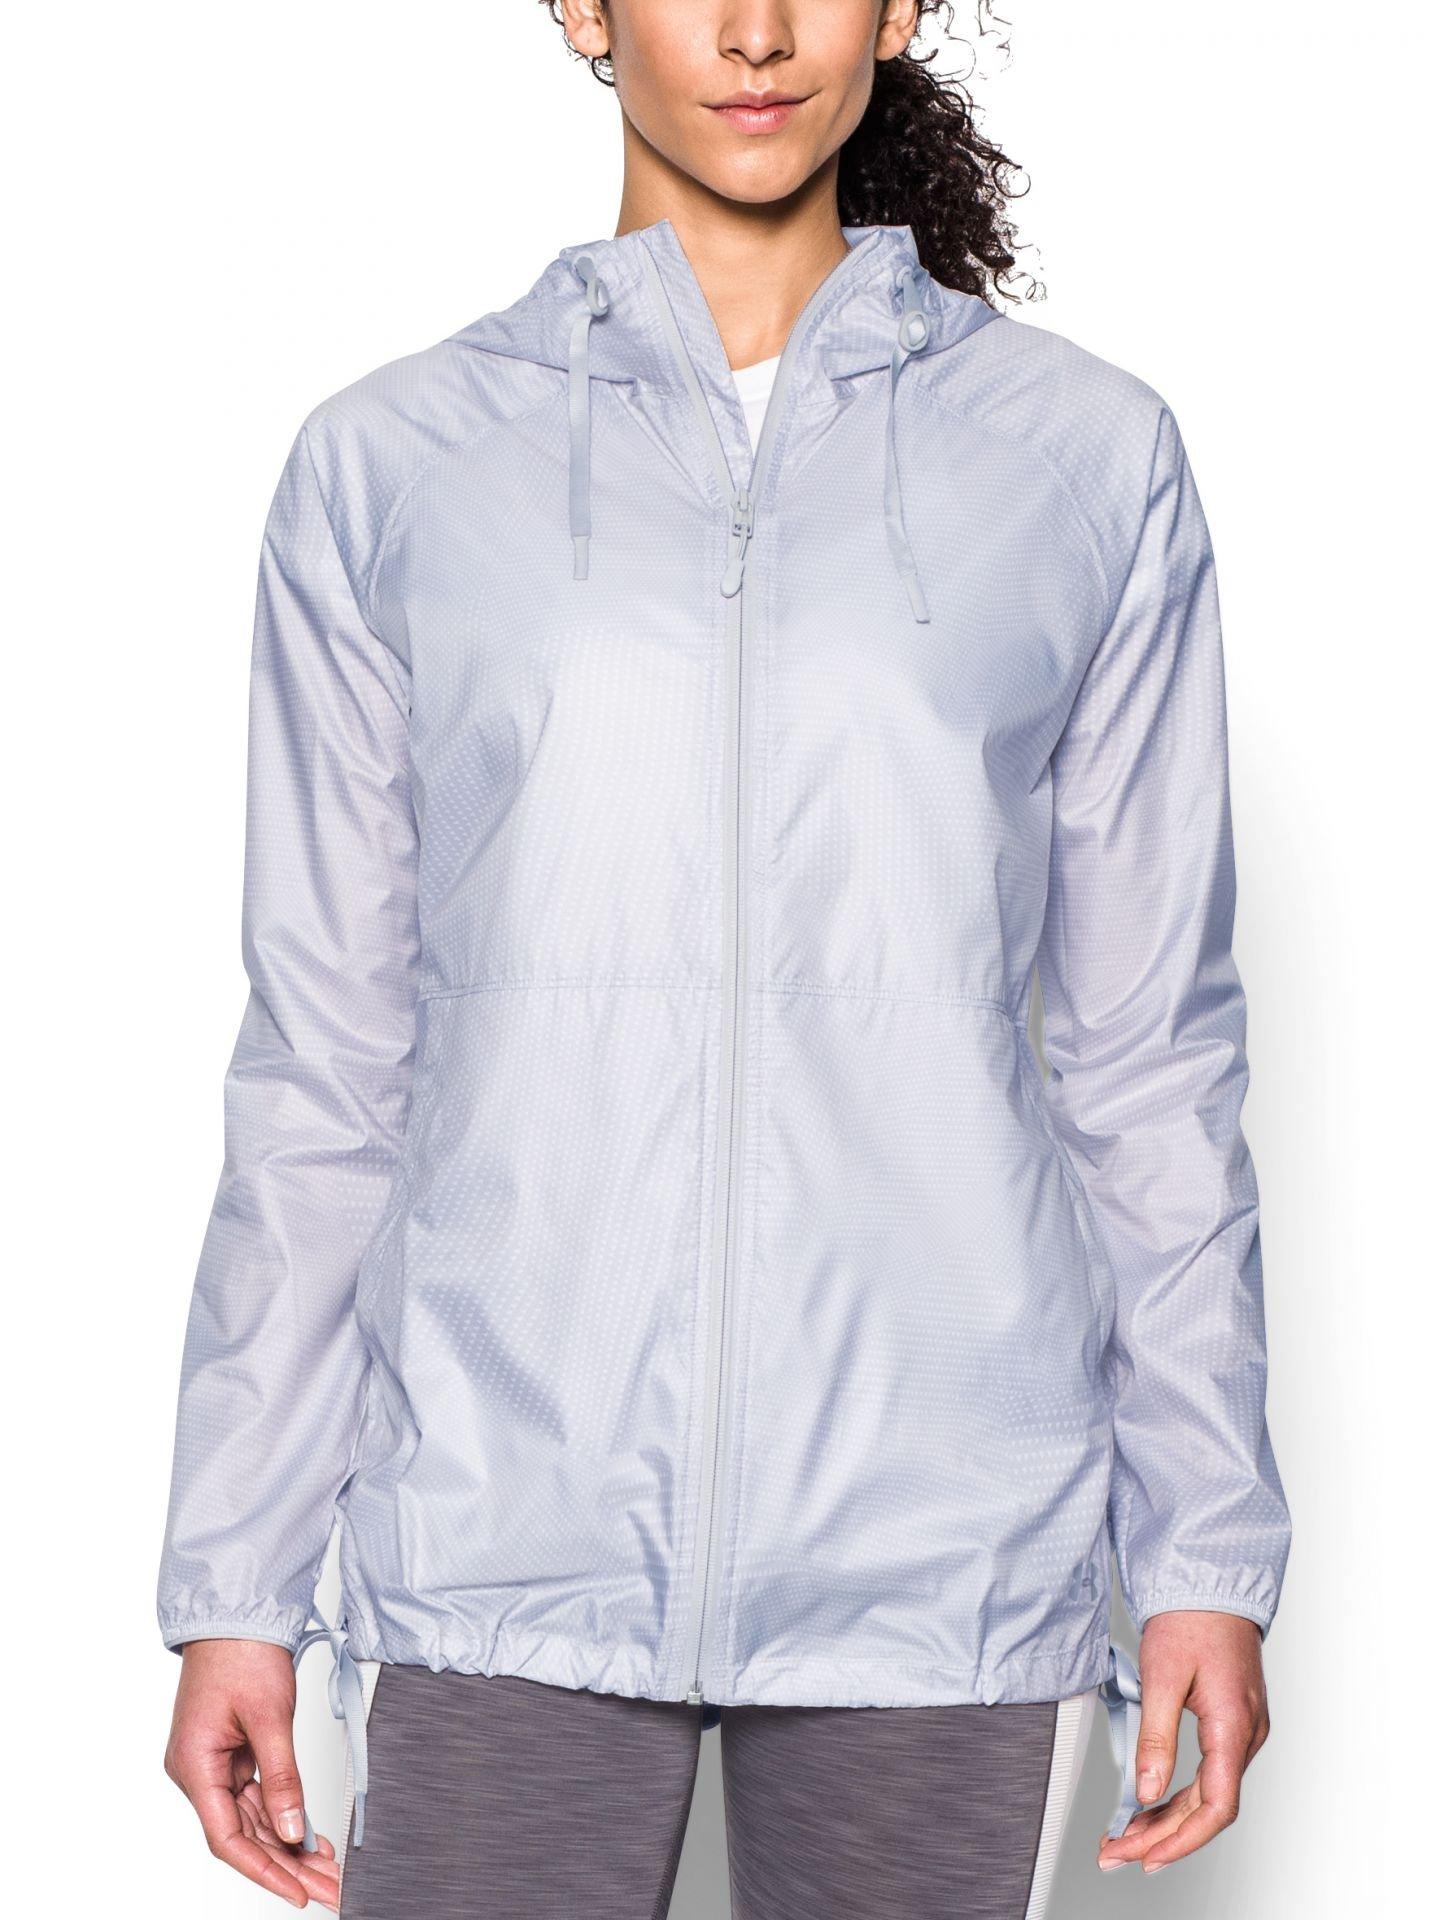 Under Armour UA Leeward giacca antivento, donna, White/Glacier Gray, S